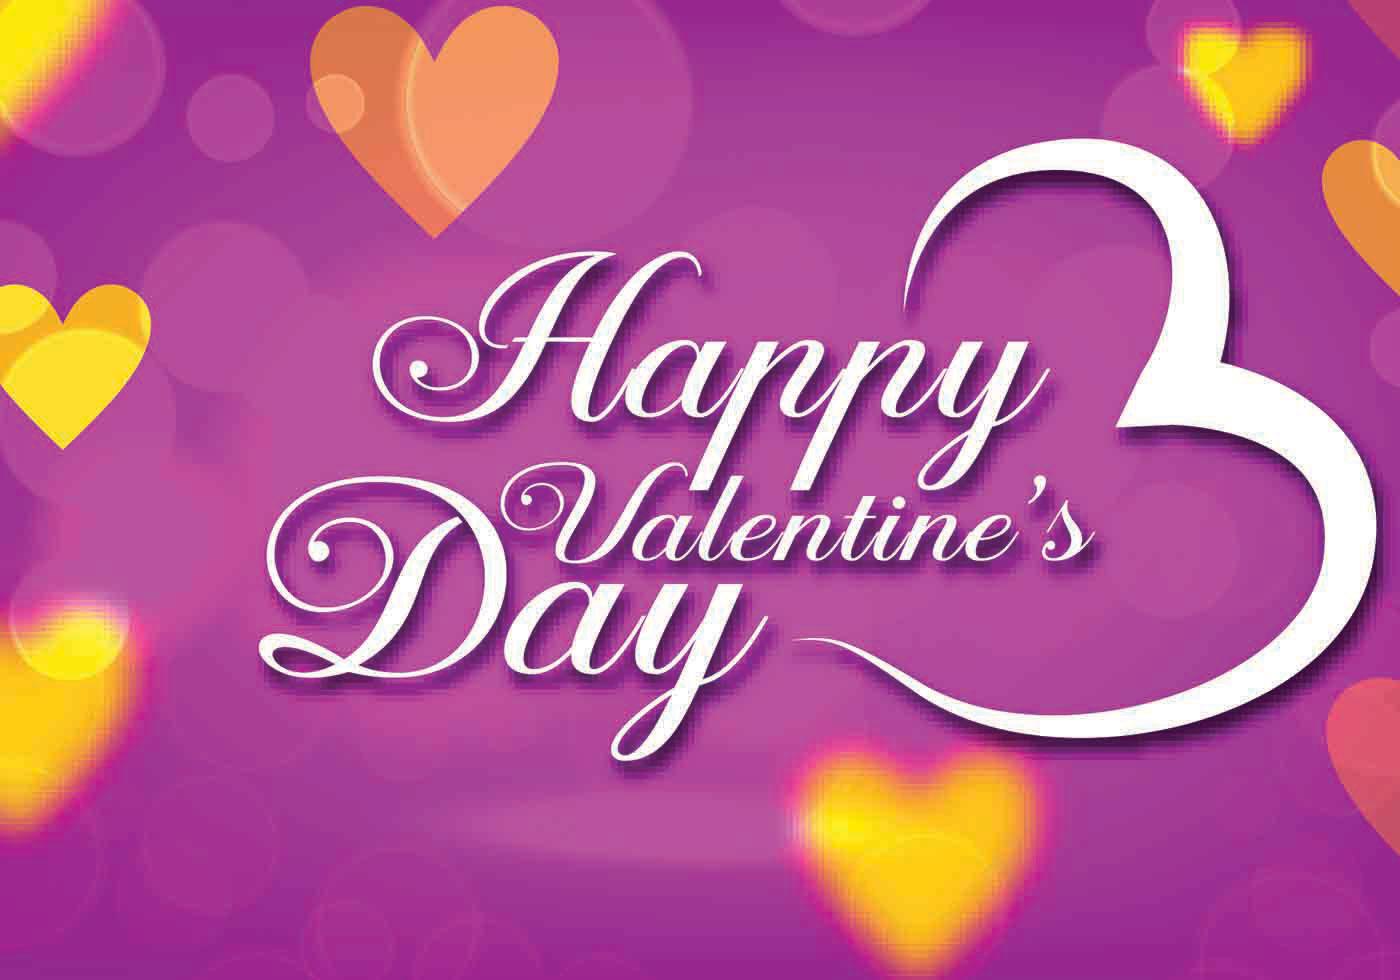 rose day love wallpaper